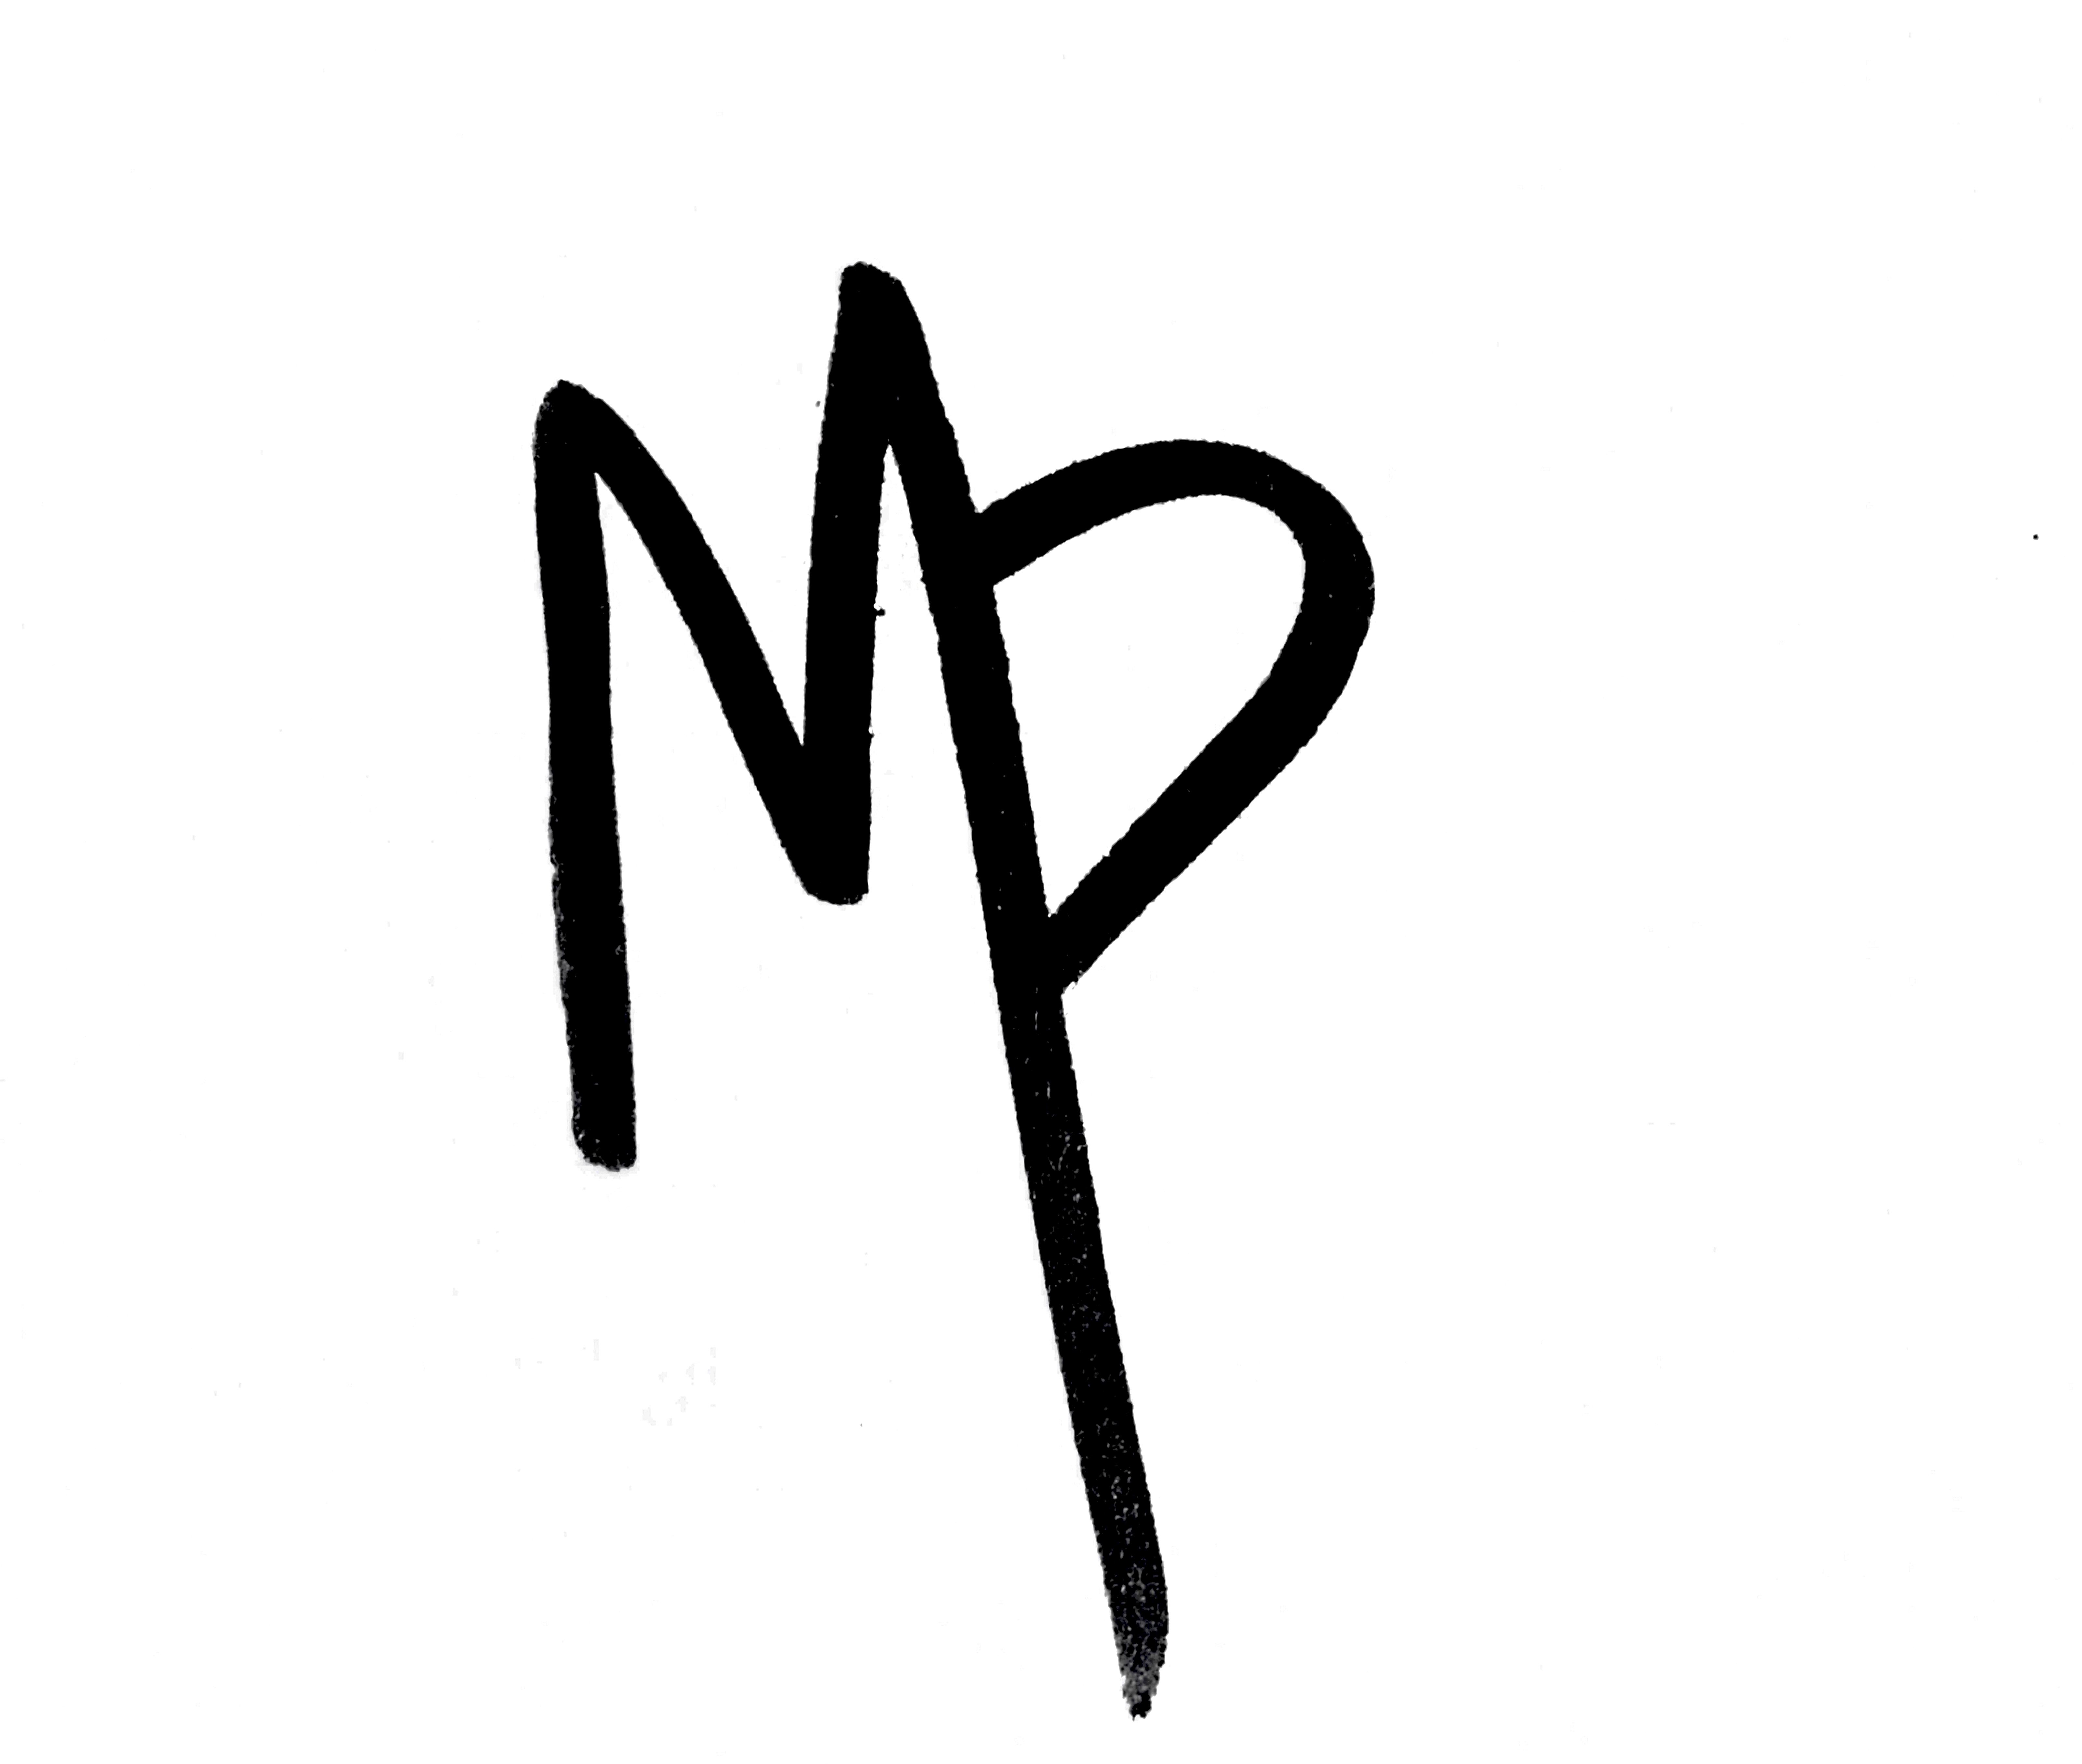 paula frança's Signature